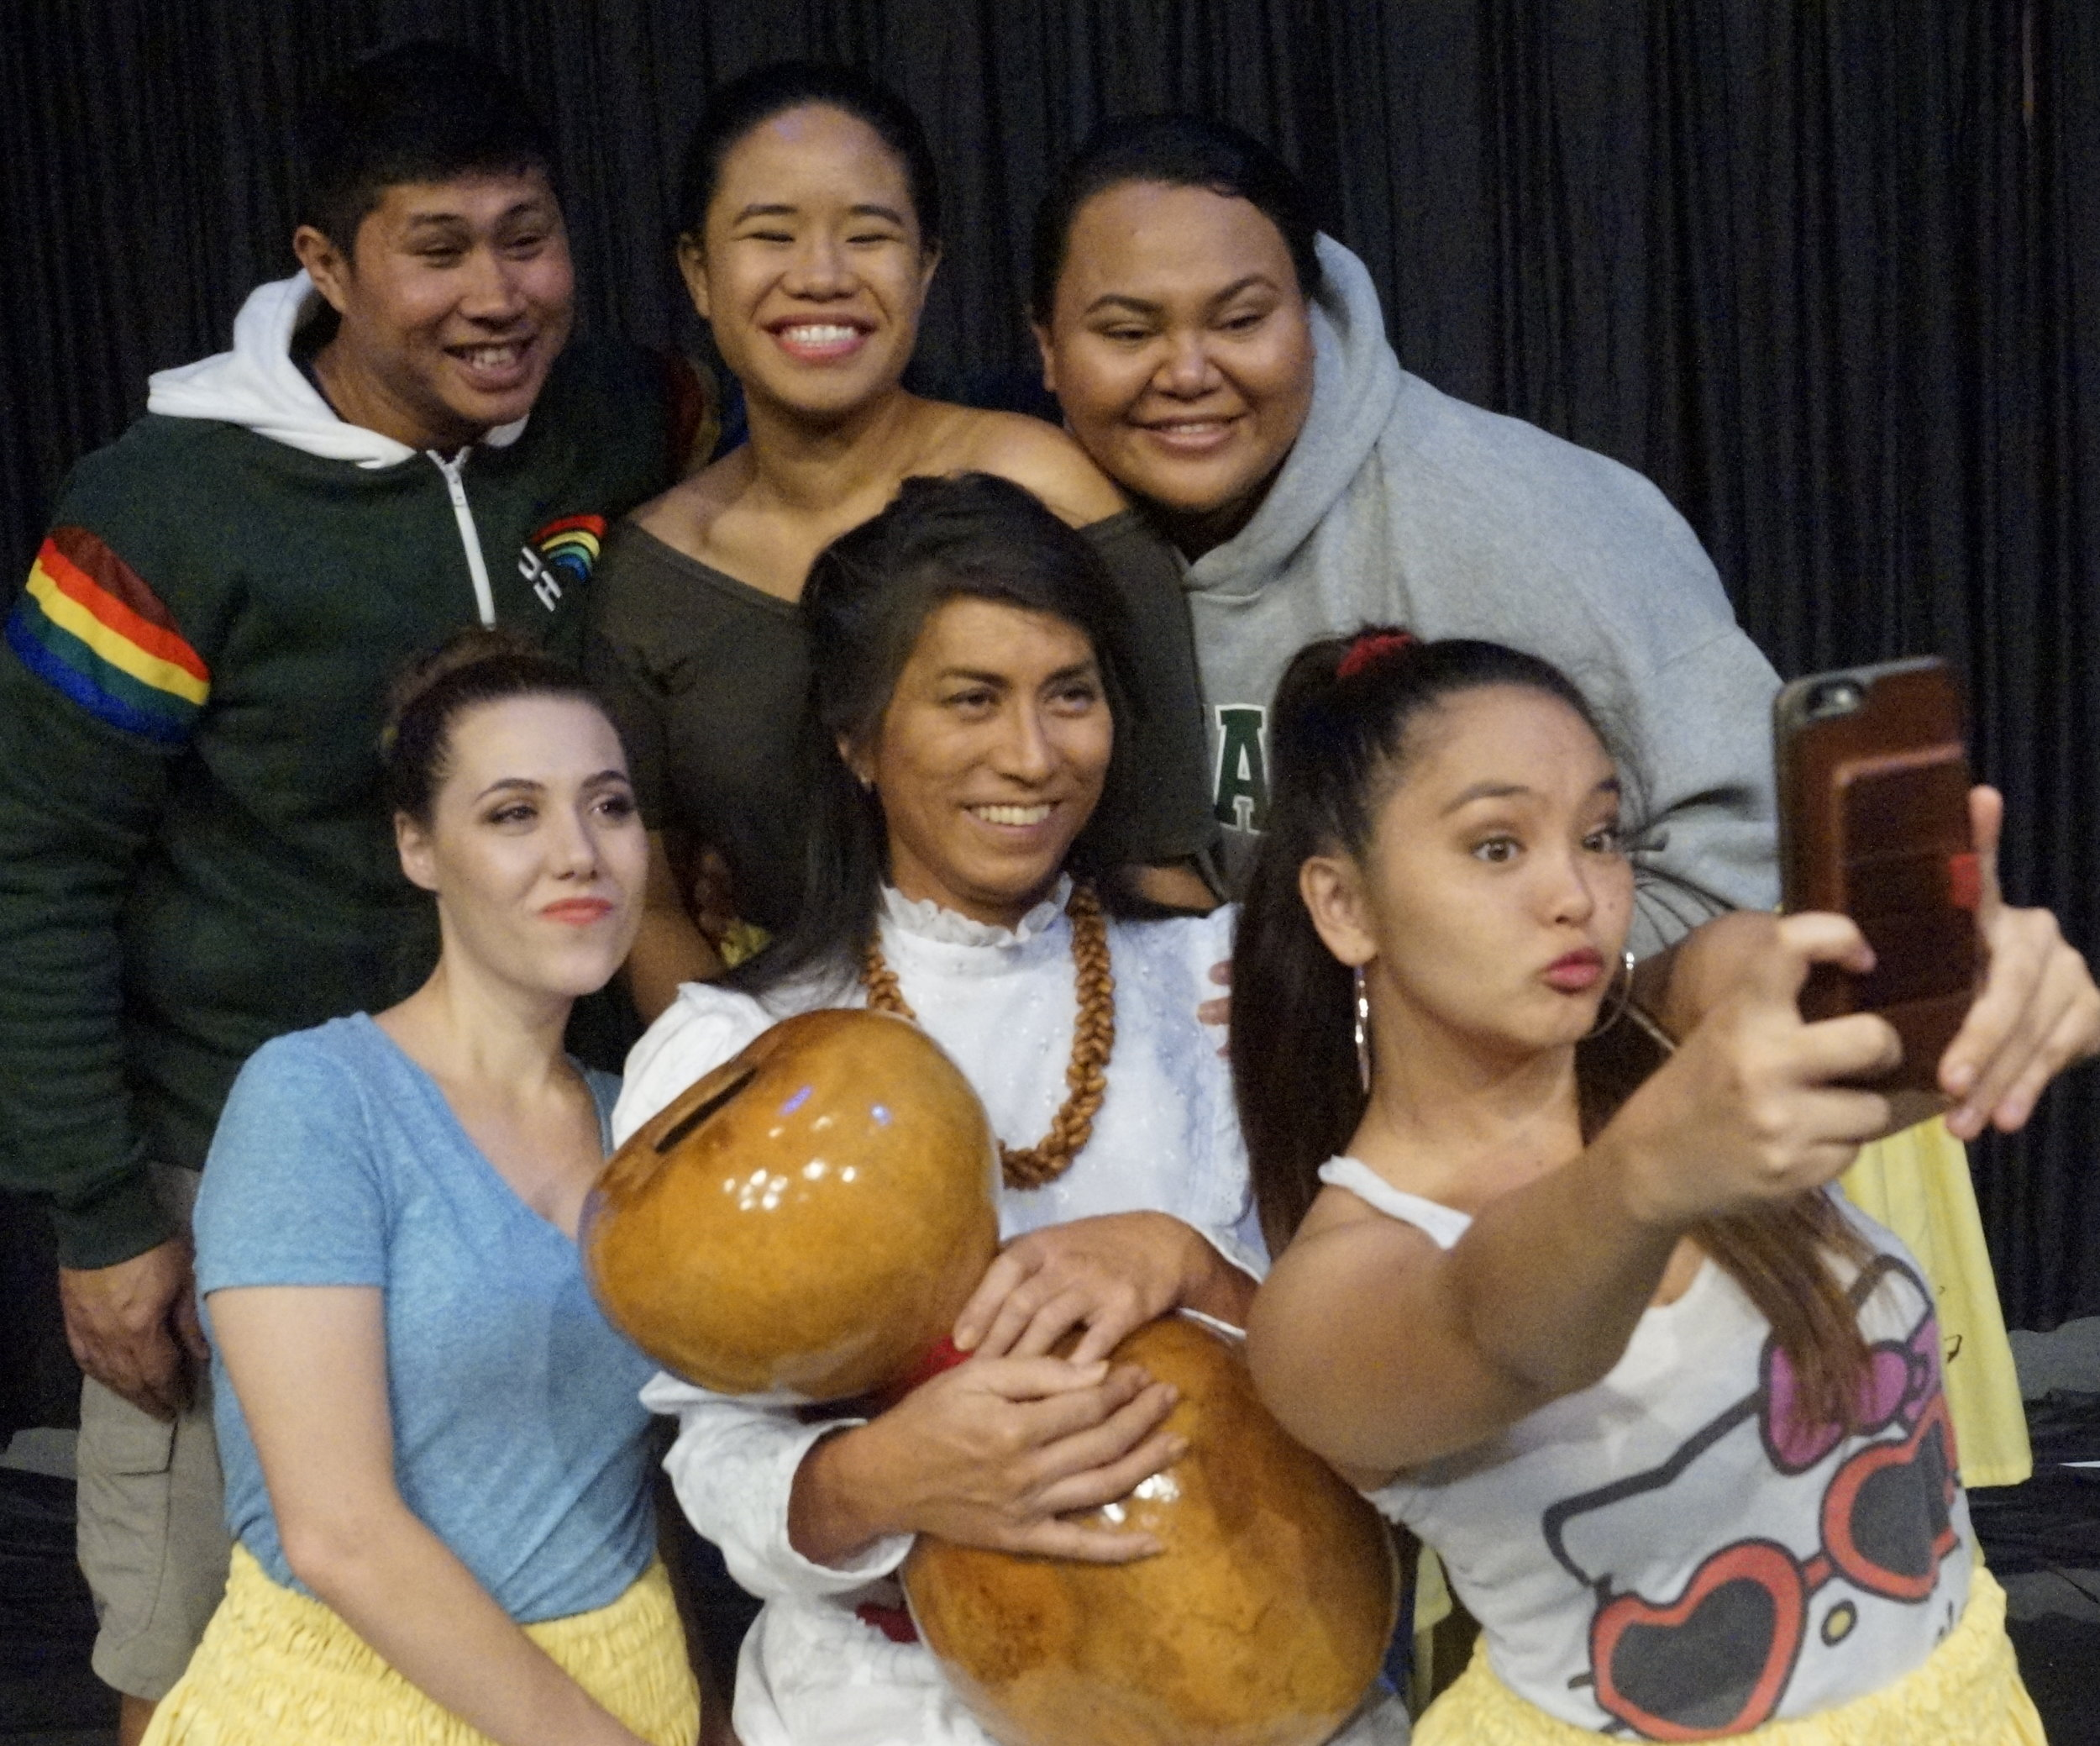 (L-R, T-B) Geph Albo, Anette Aga, Lelea'e Kahalepuna Wong, Jaime Bradner, Kahana Ho, Katja Berthold selfie.